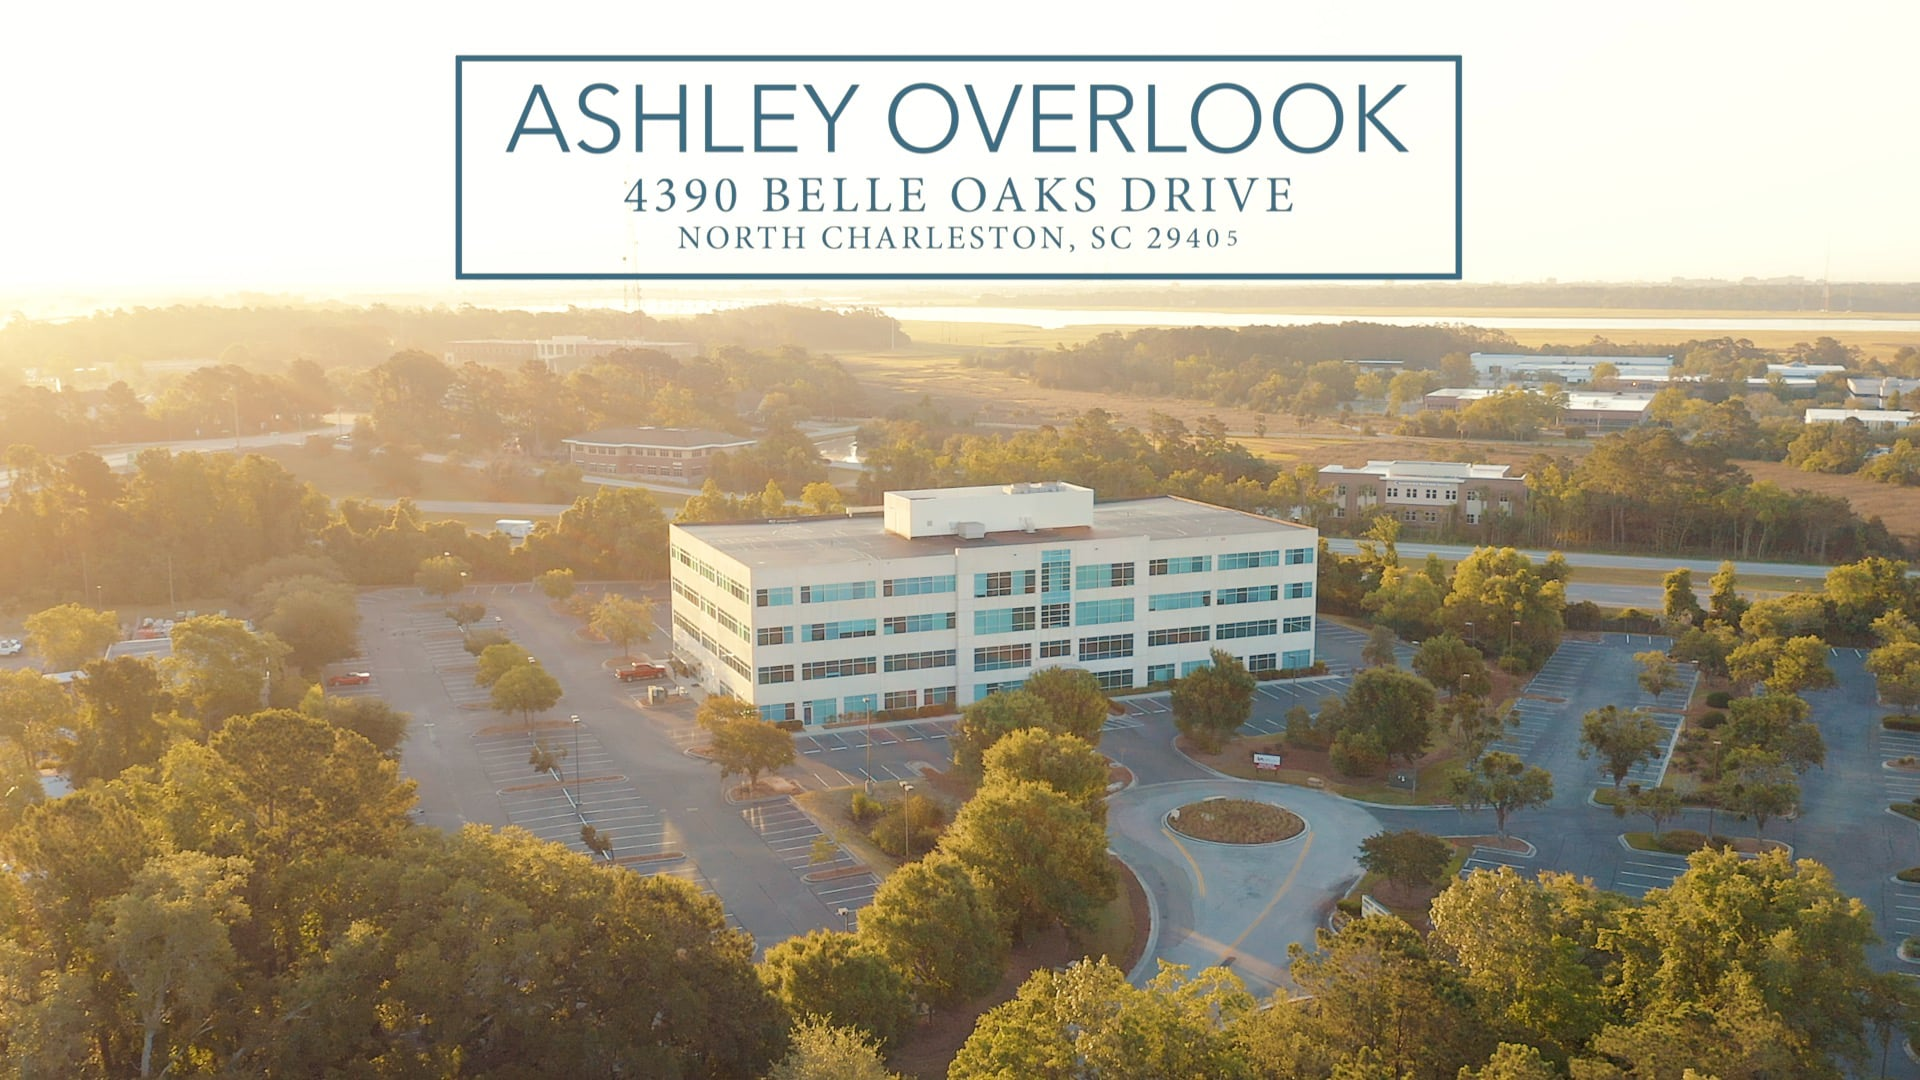 Ashley Overlook Highlight